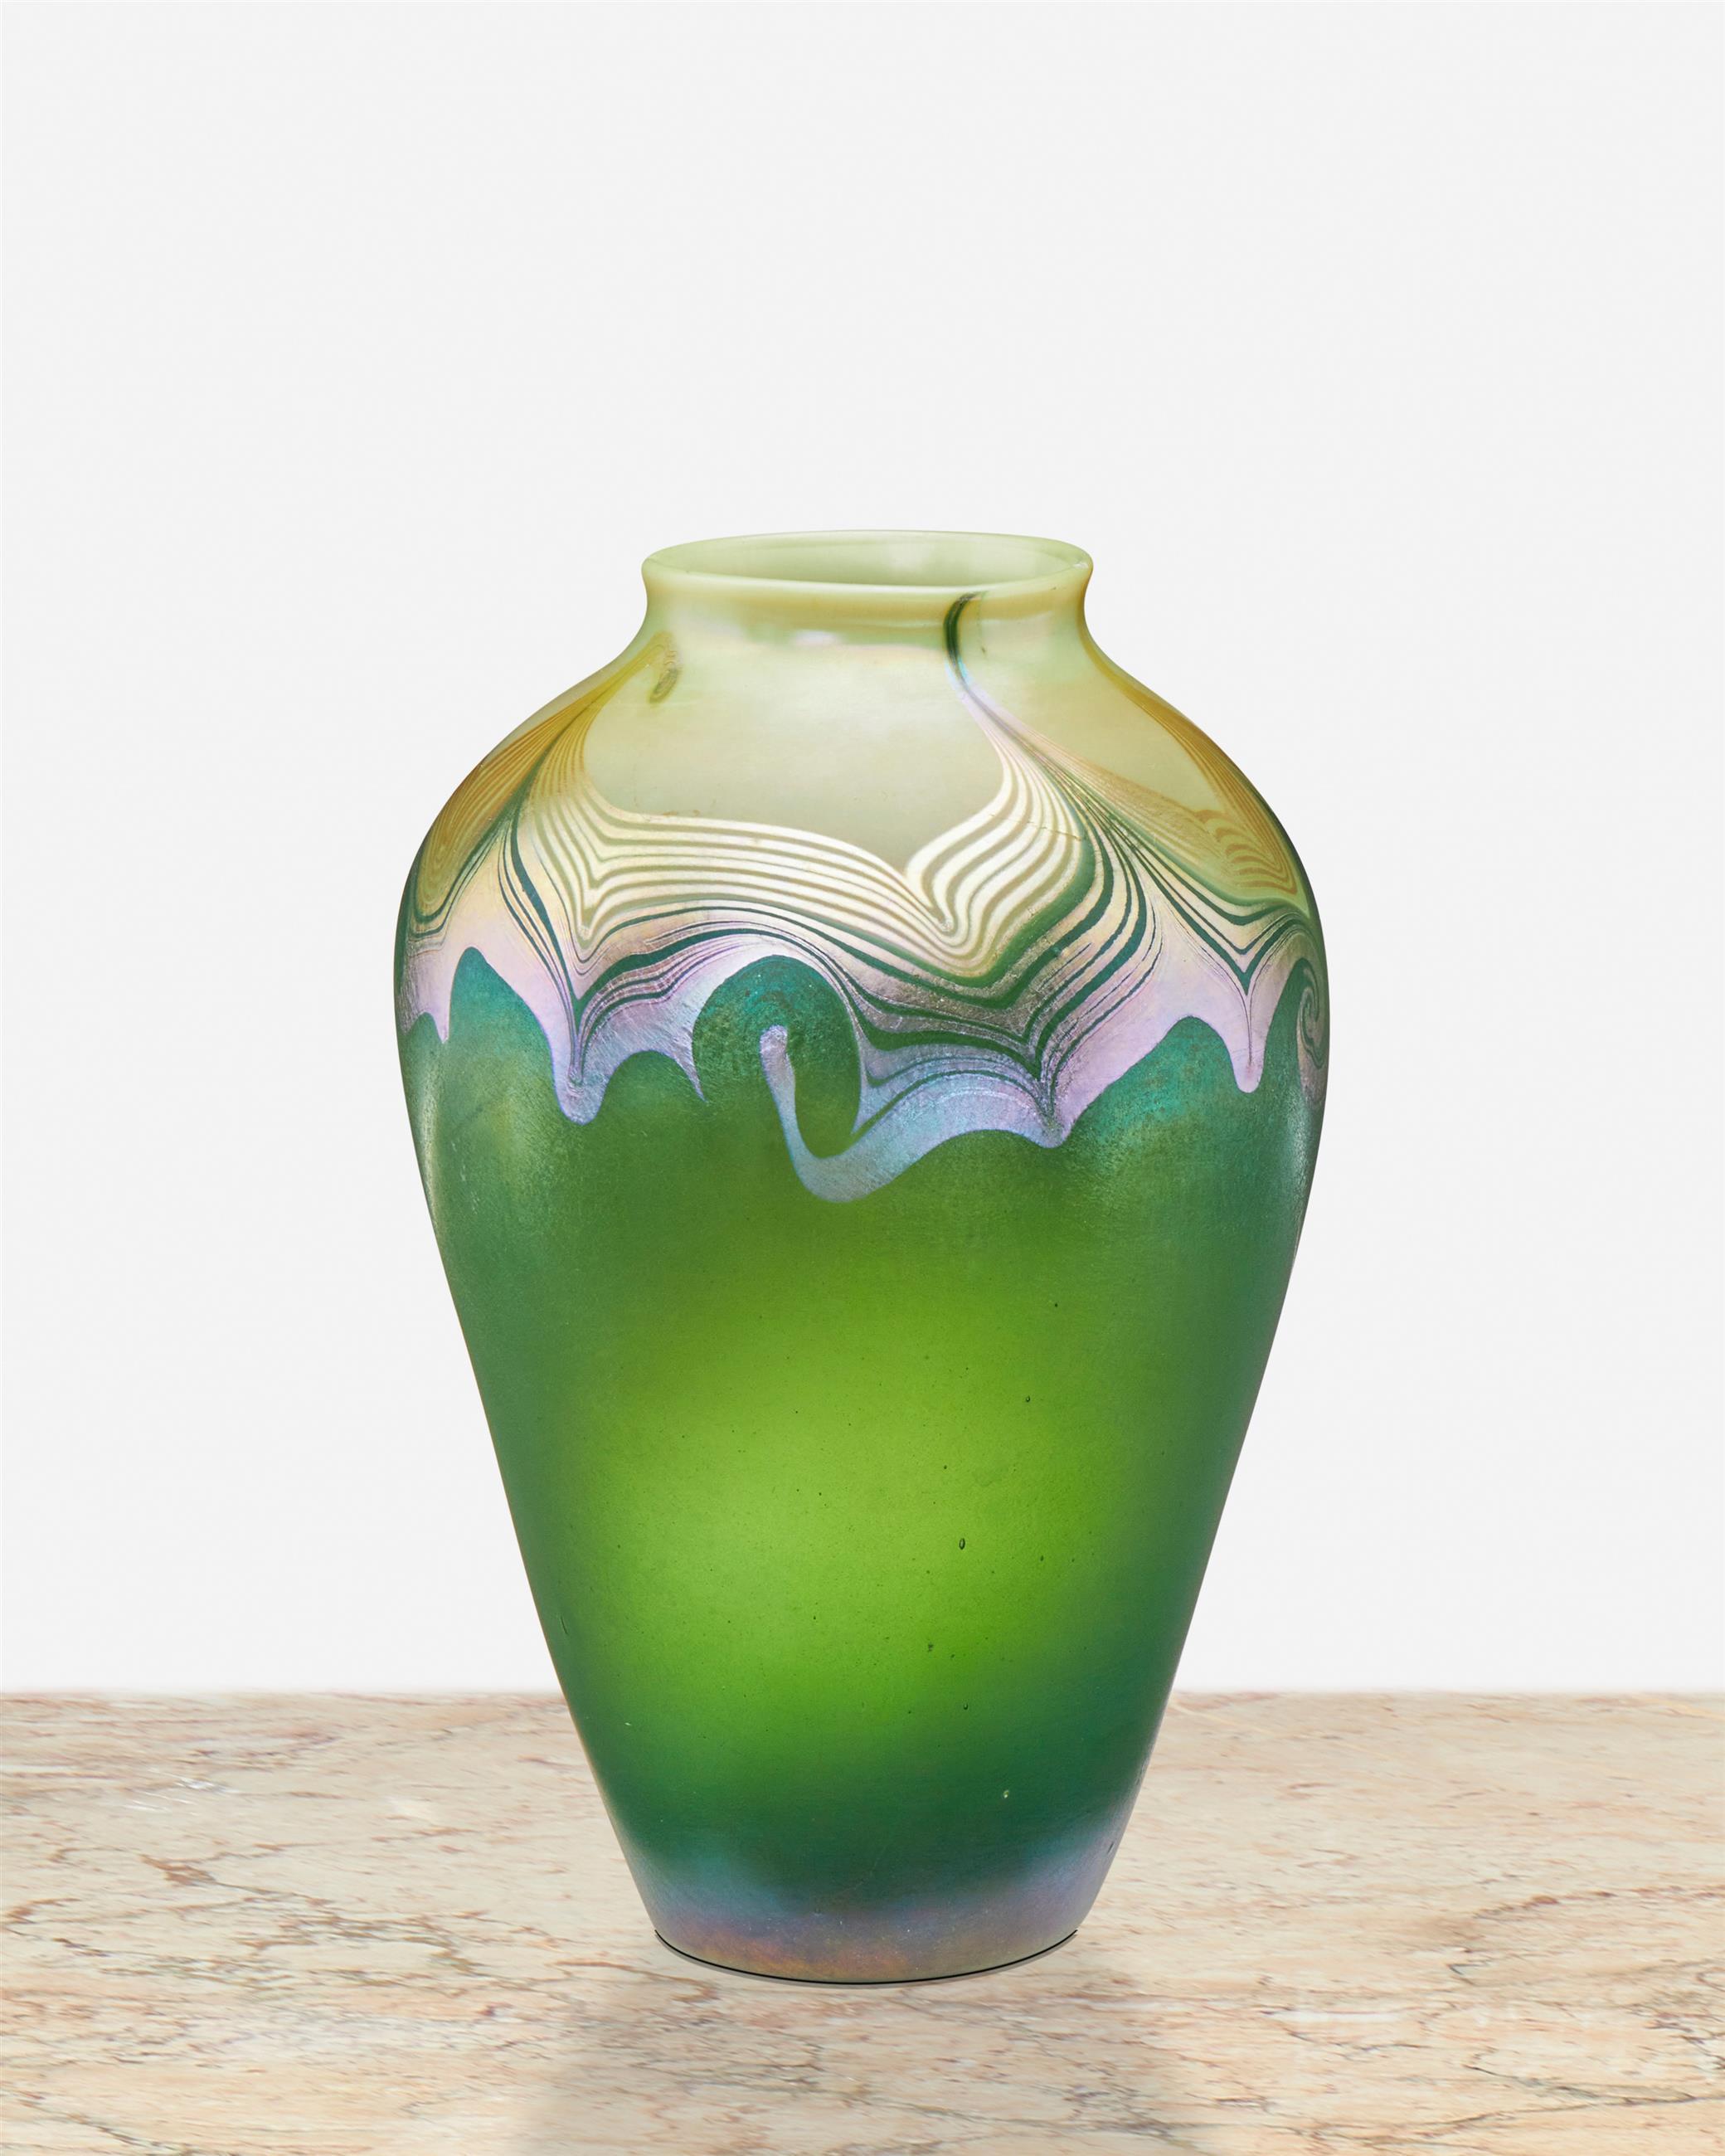 A L.C. Tiffany Favrile glass vase